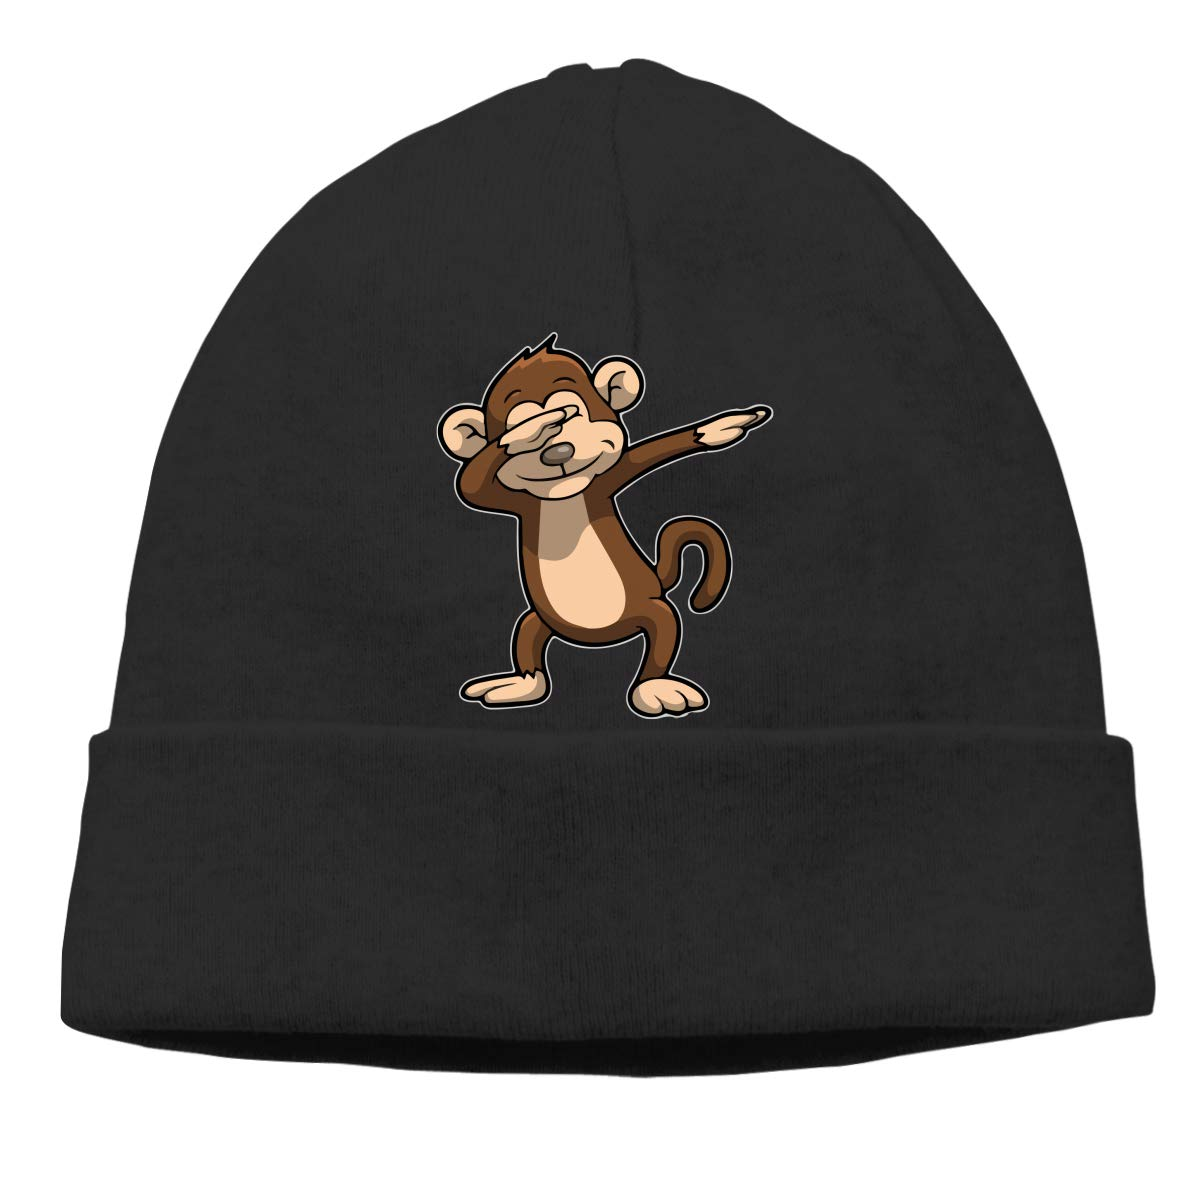 GDSG5/&4 Funny Monkey Men//Women Helmet Liner Cycling Skull Cap